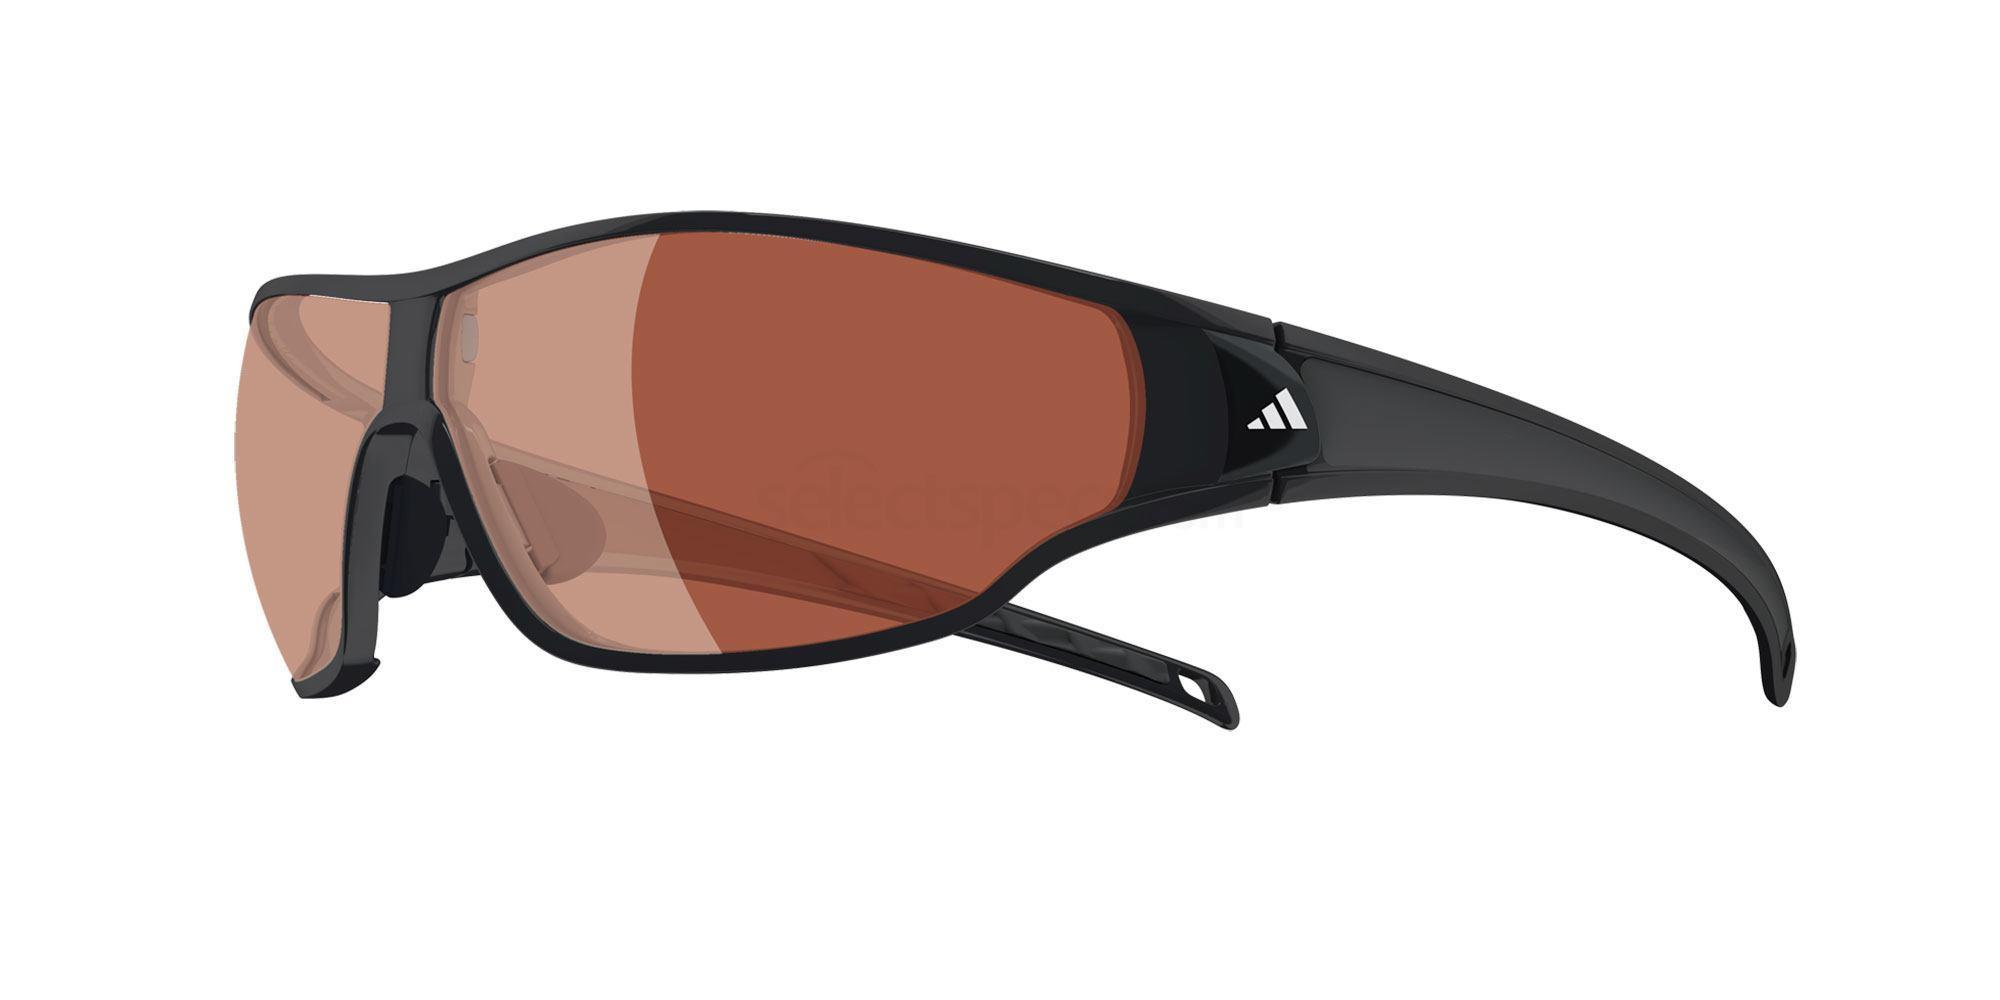 00 6050 a192 Tycane S Sunglasses, Adidas